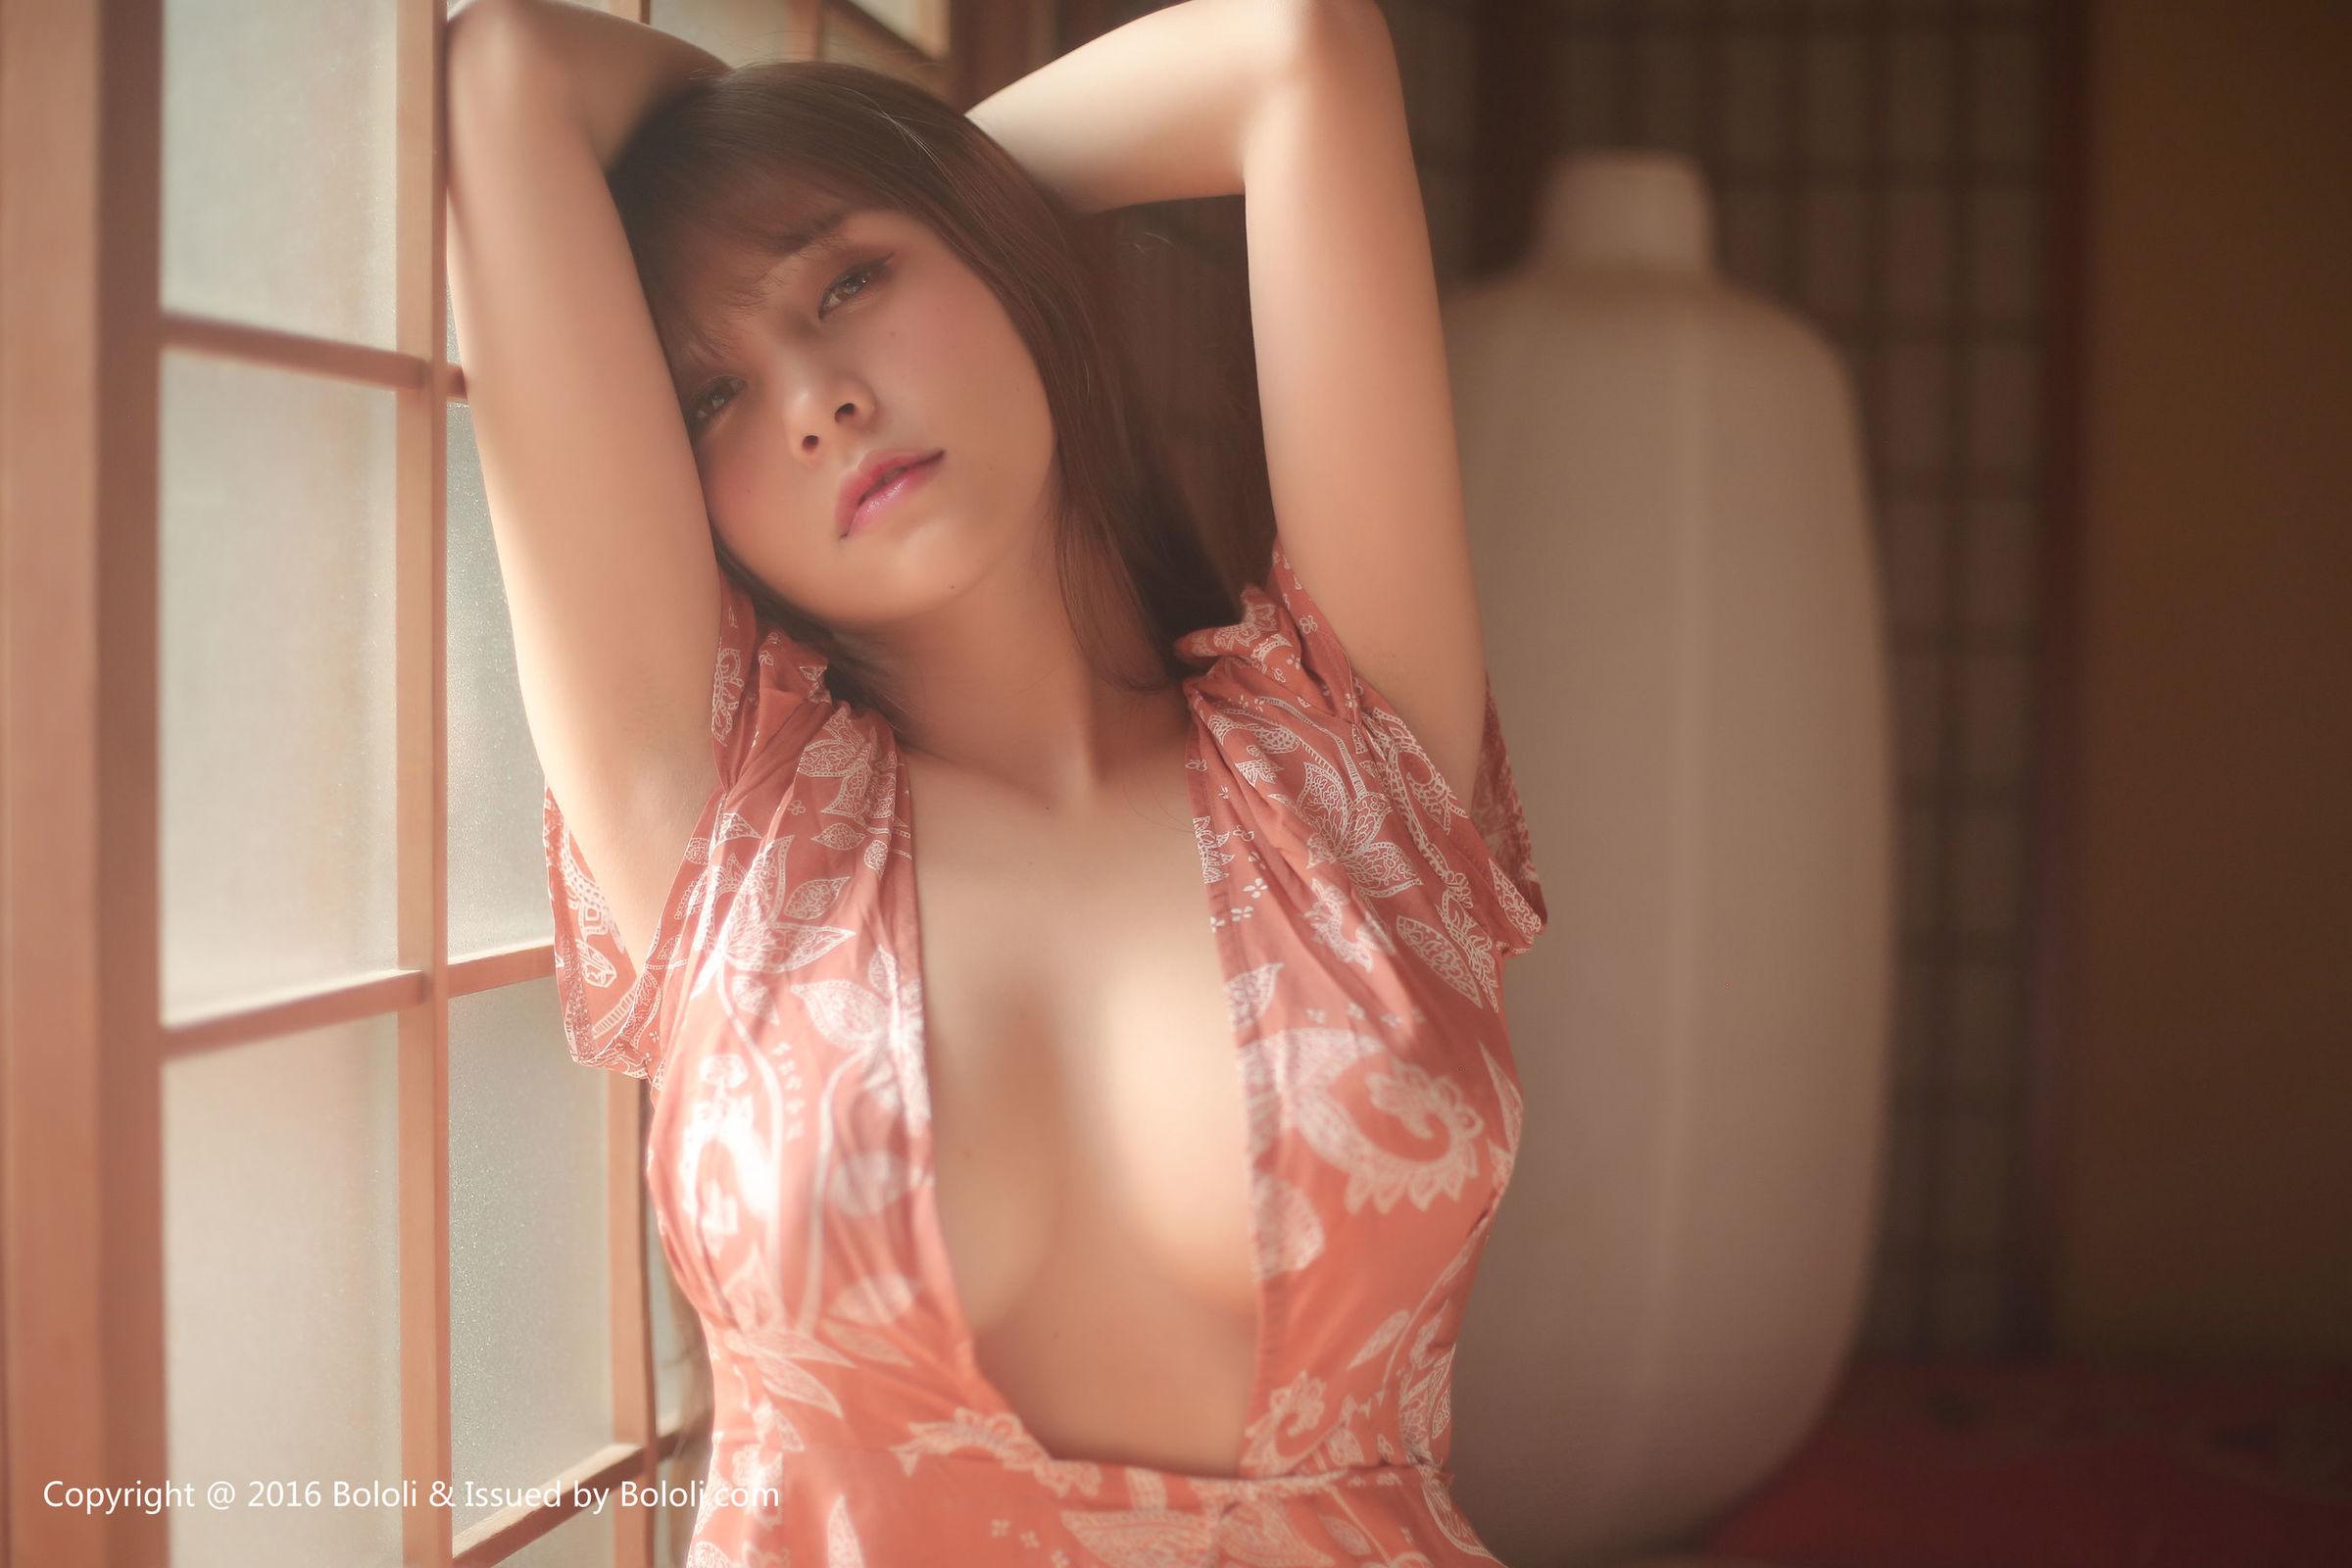 [Bololi波萝社] BOL.089 夏美酱 - 芭蕾舞少女 丝袜美图[47P]